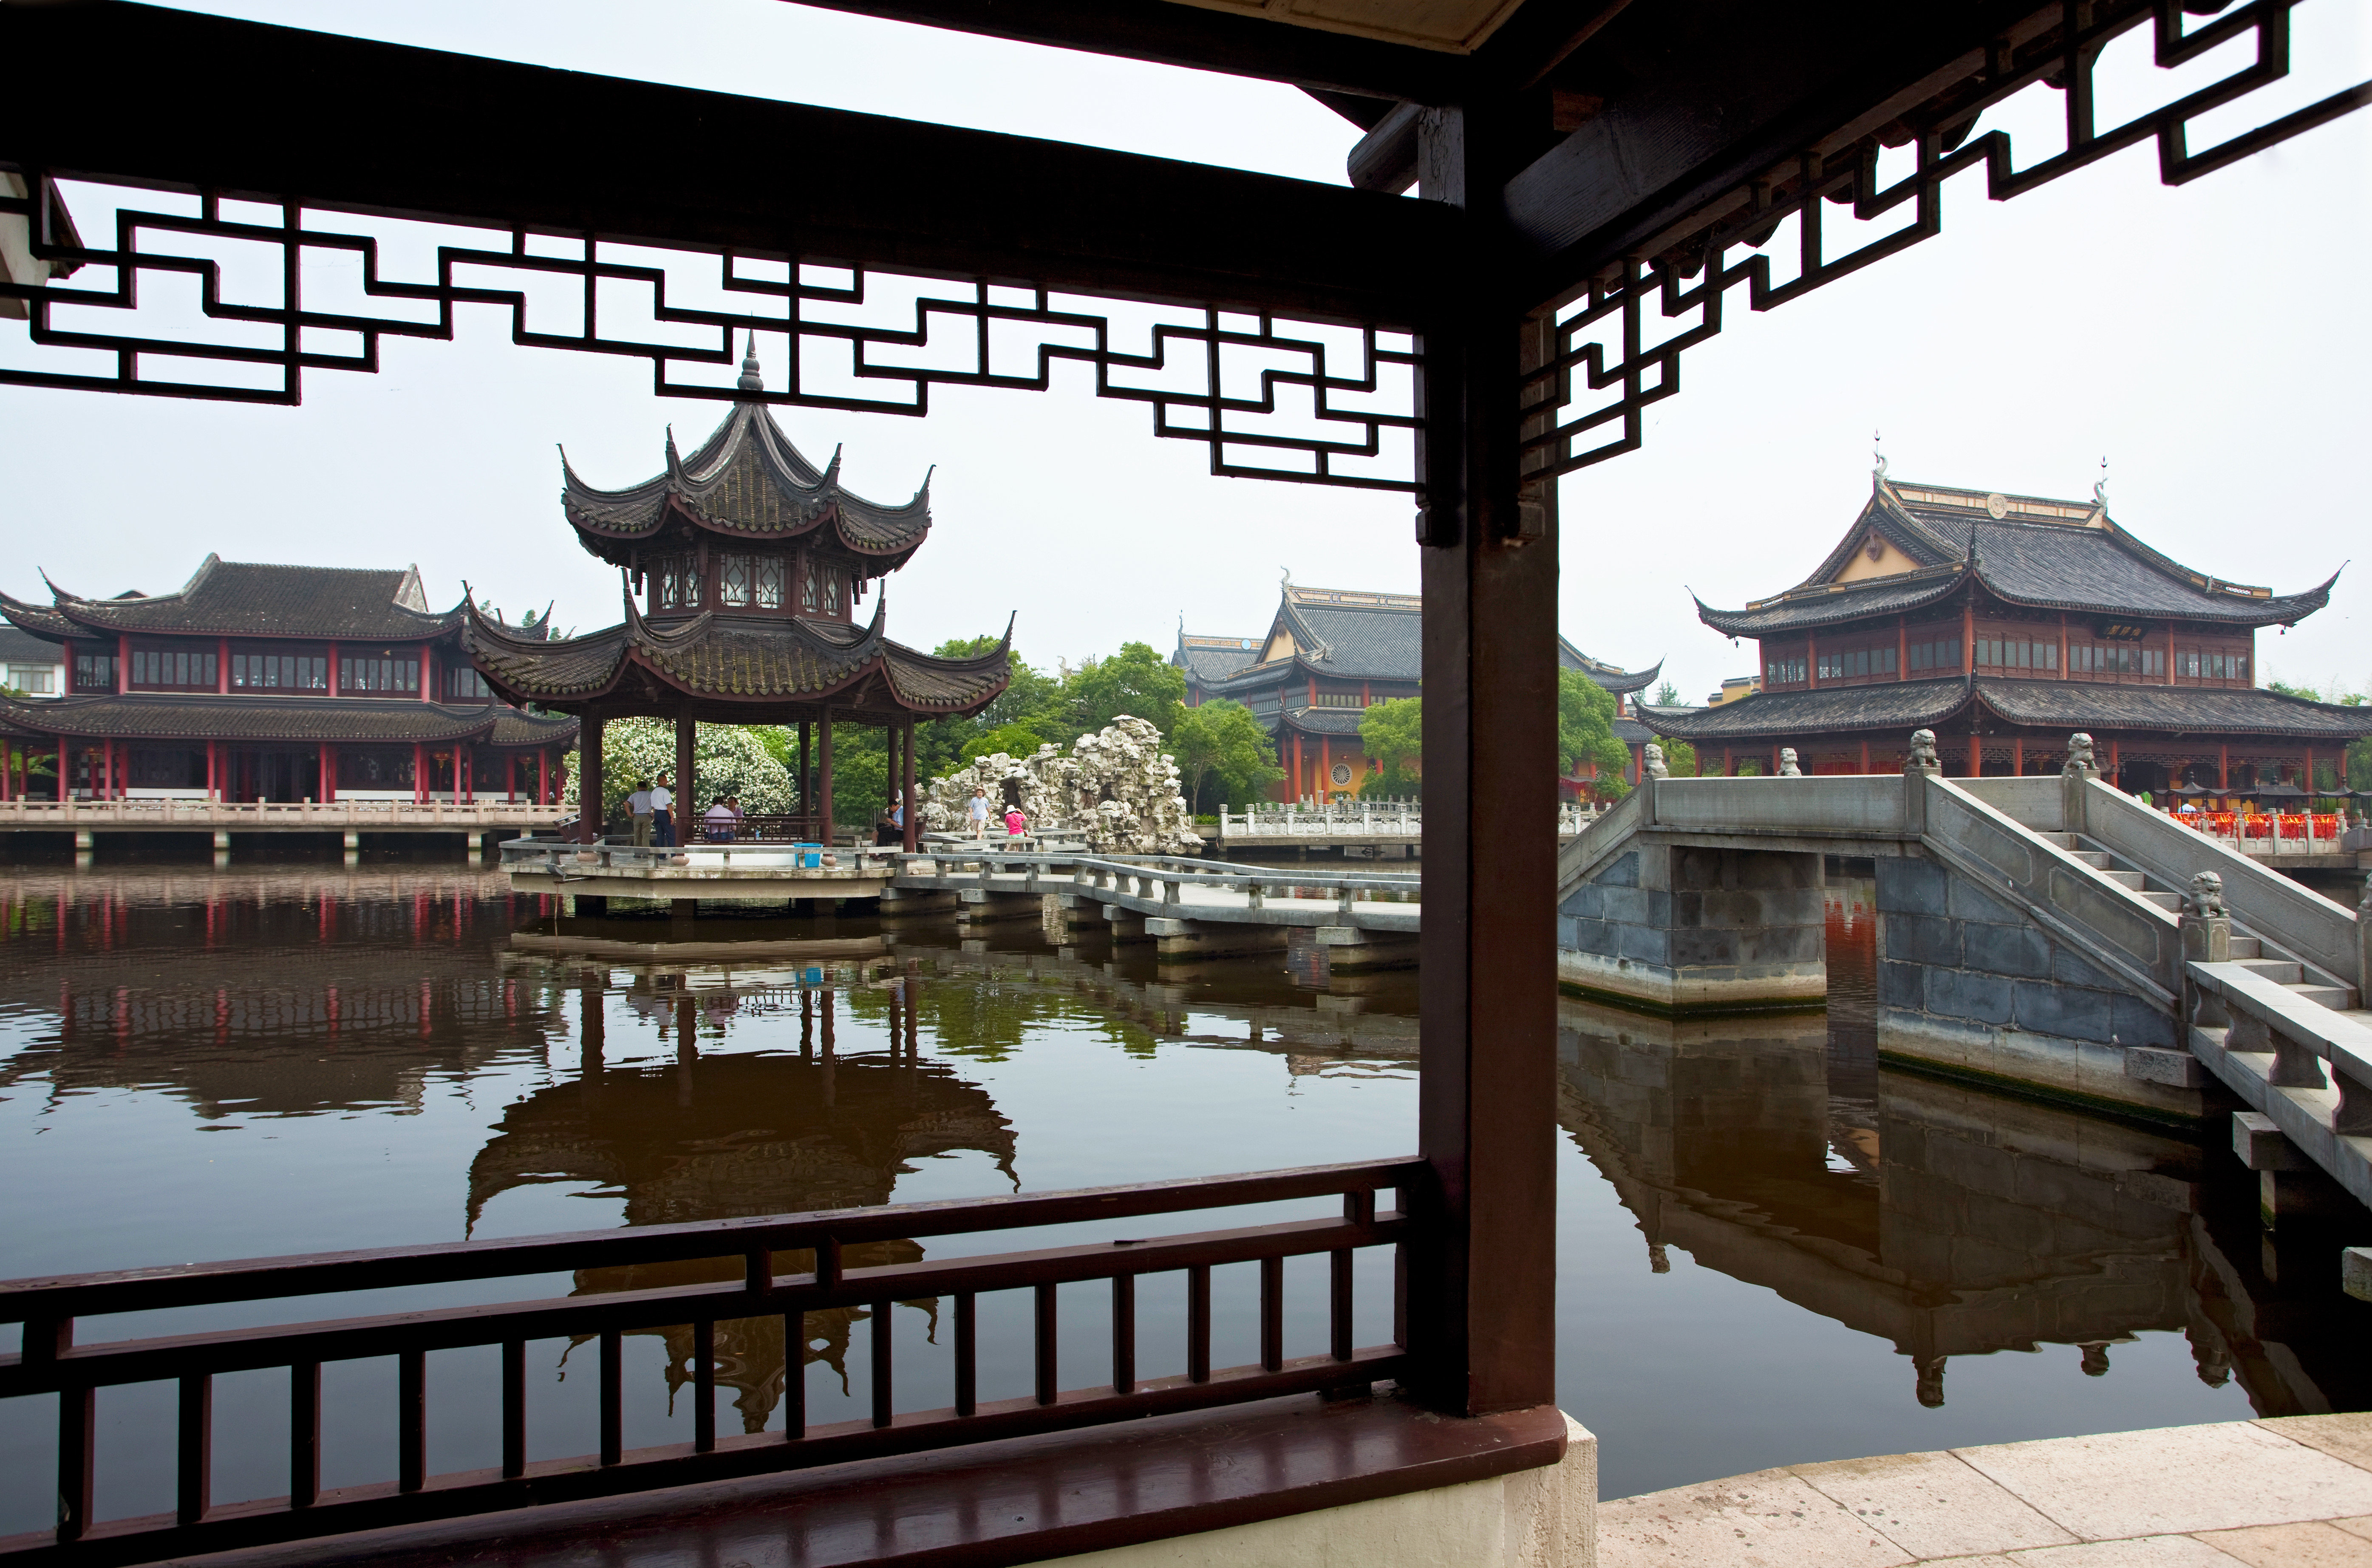 Architecture Buildings Cultural Exterior Luxury Waterfront landmark temple shrine travel Resort tourist attraction